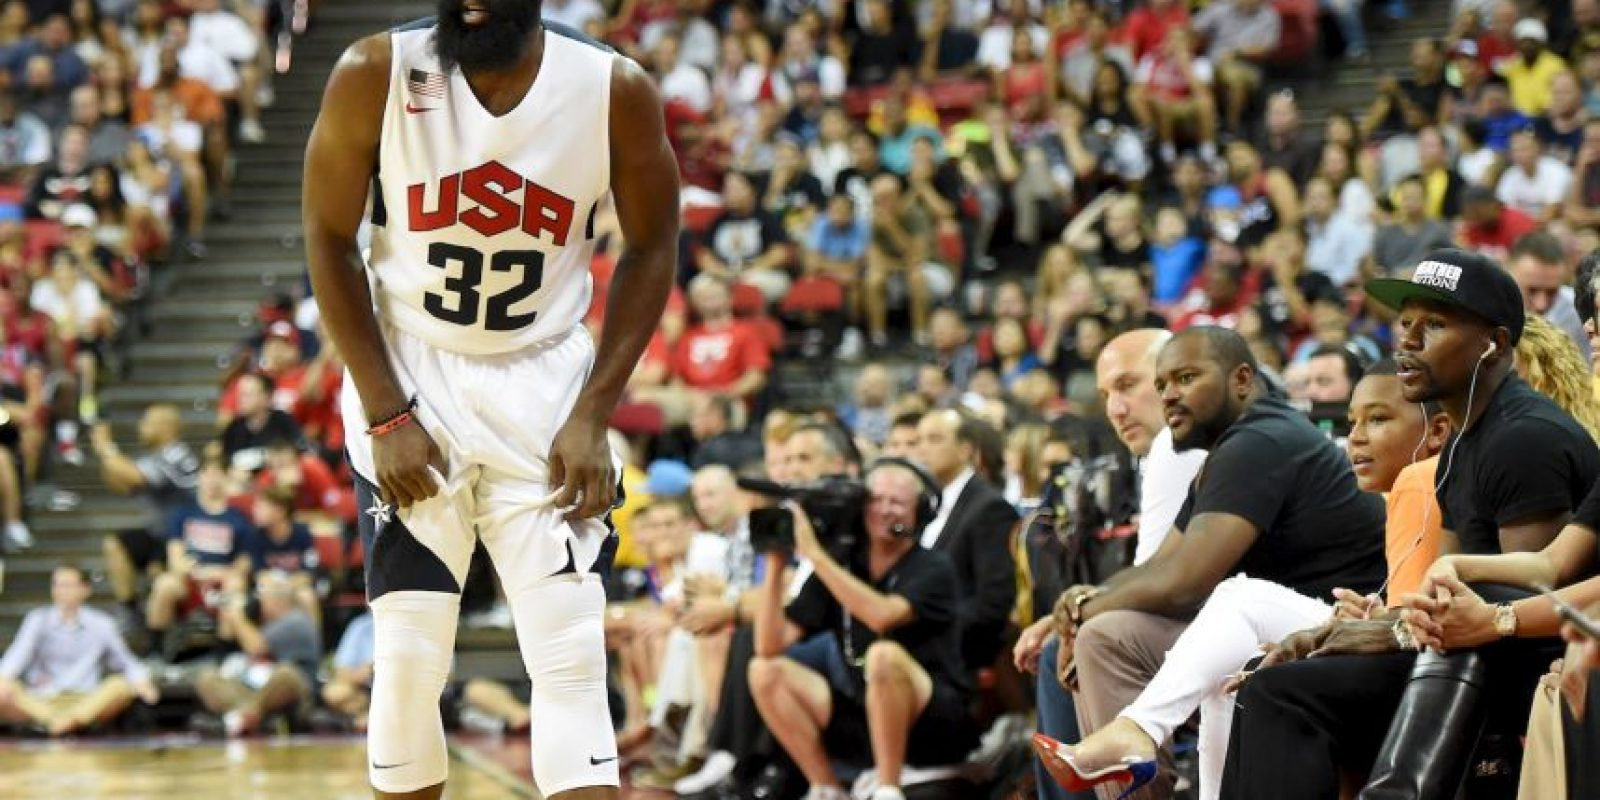 Mayweather: Paul George, basquetbolista de la NBA. Foto:Getty Images